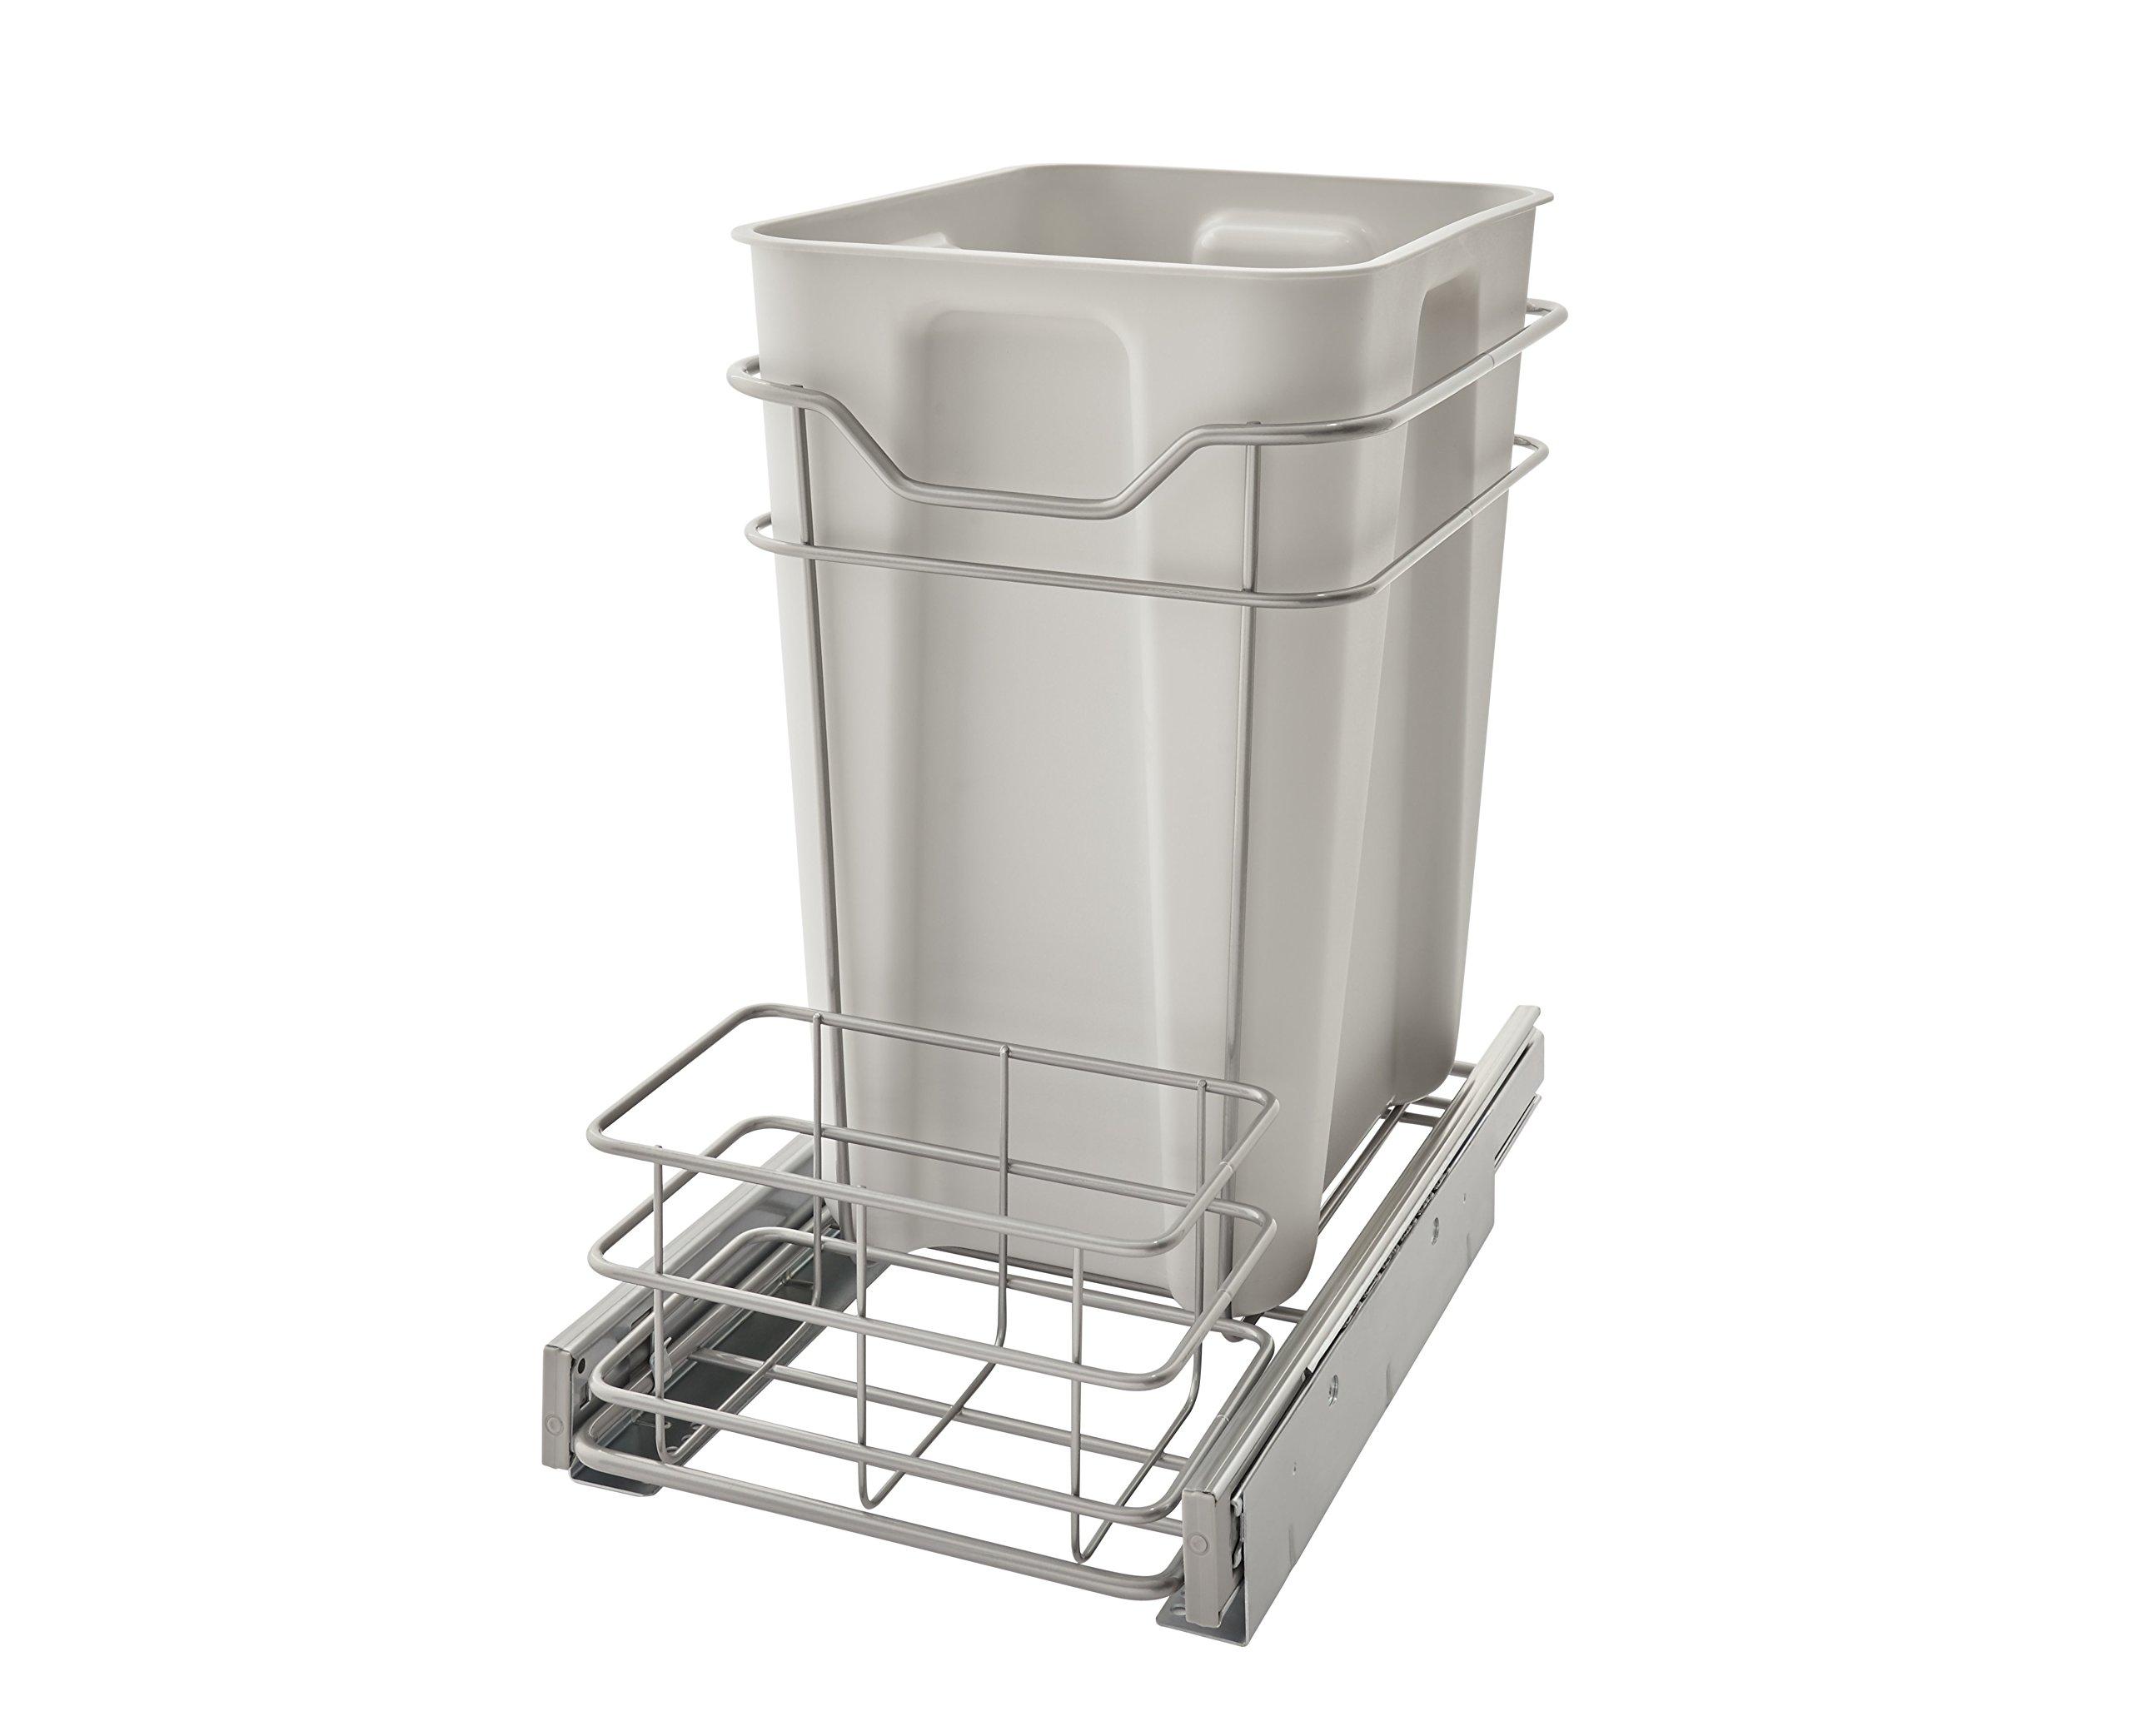 ClosetMaid 32102 Premium 24 Quart Cabinet Pull Out Trash Bin